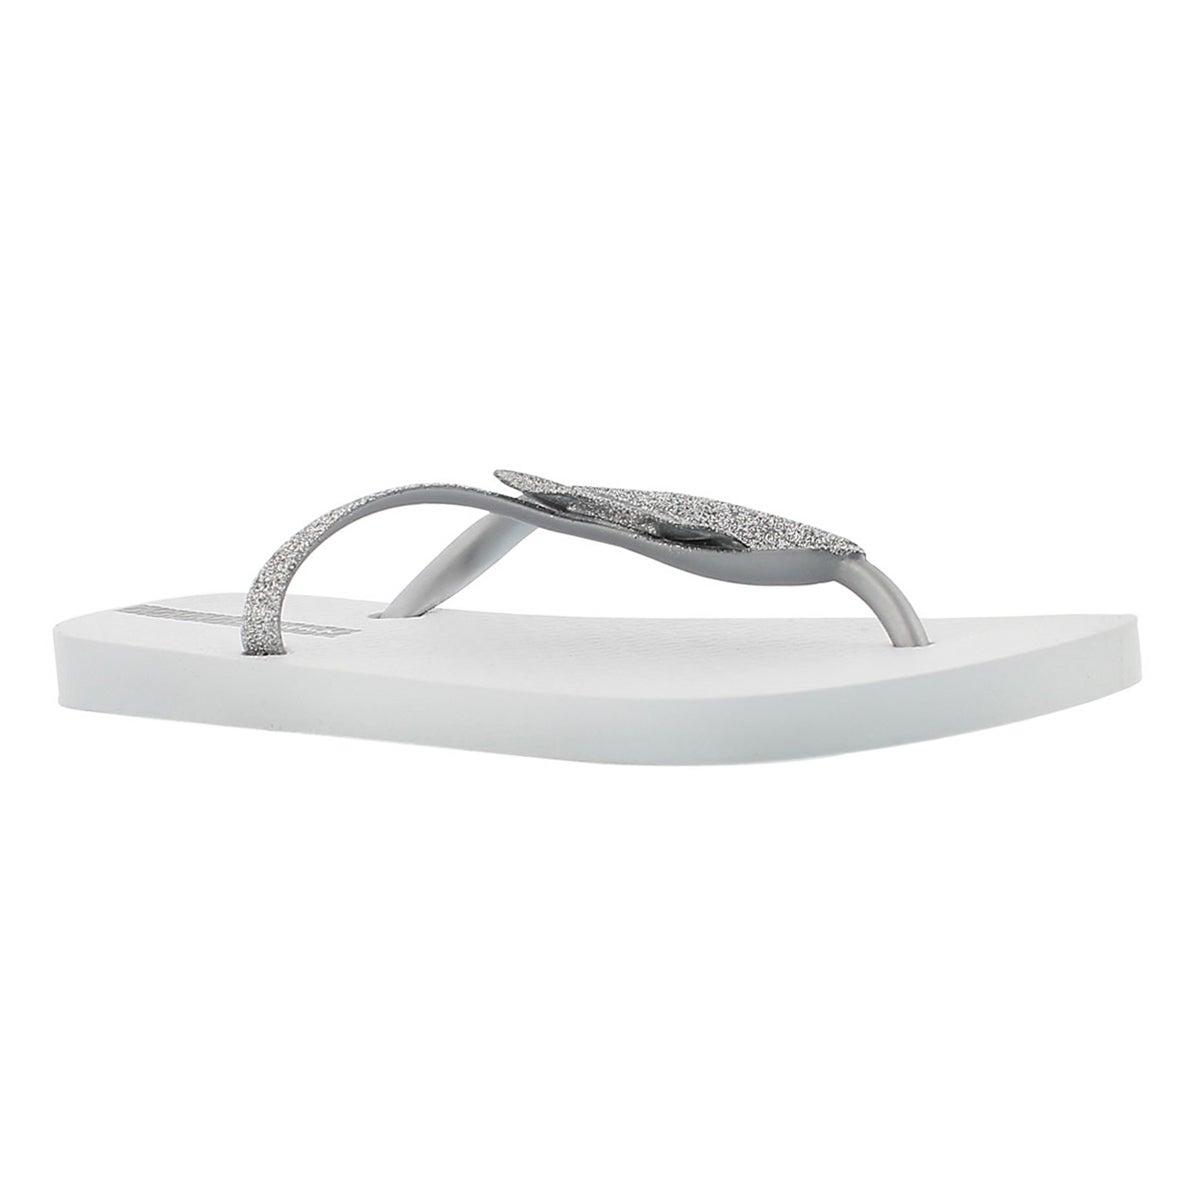 Women's LOLITA II white bow detail flip flops